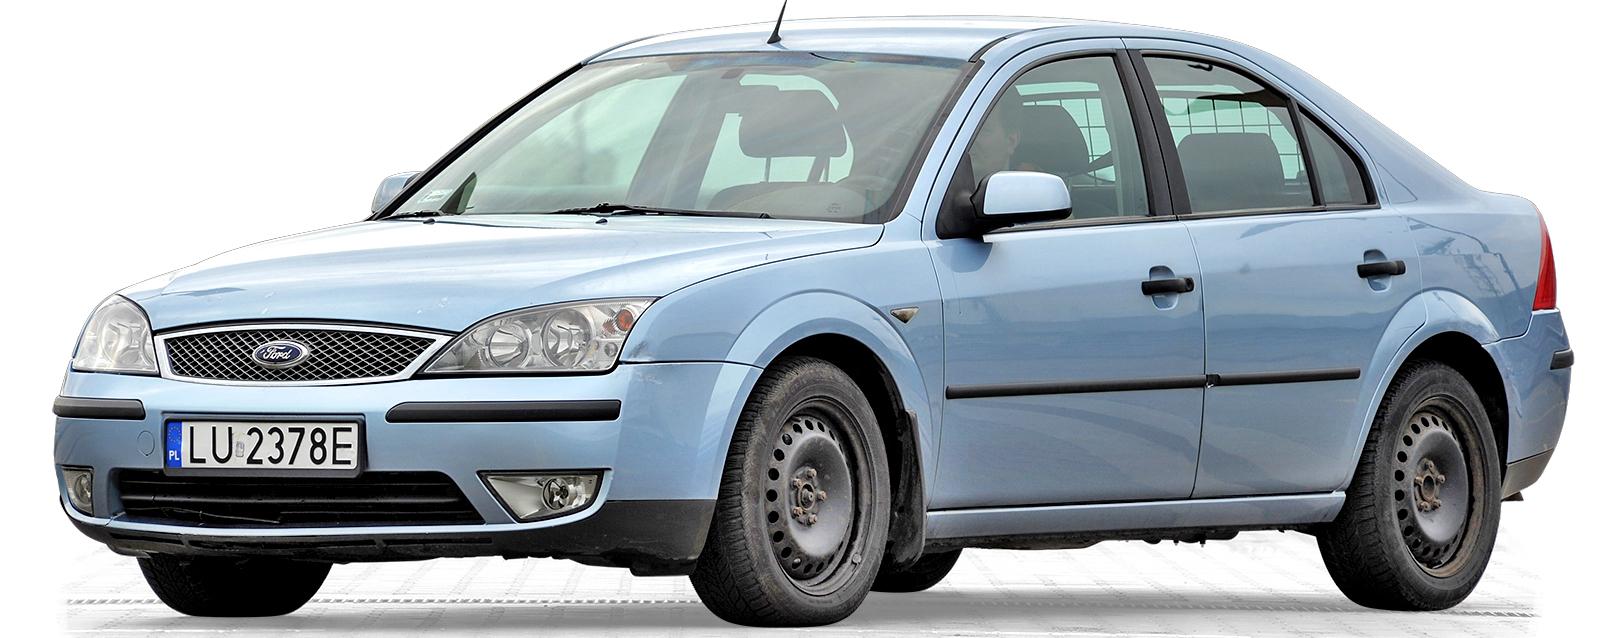 Ford Mondeo Mk3 2.0 TDCi